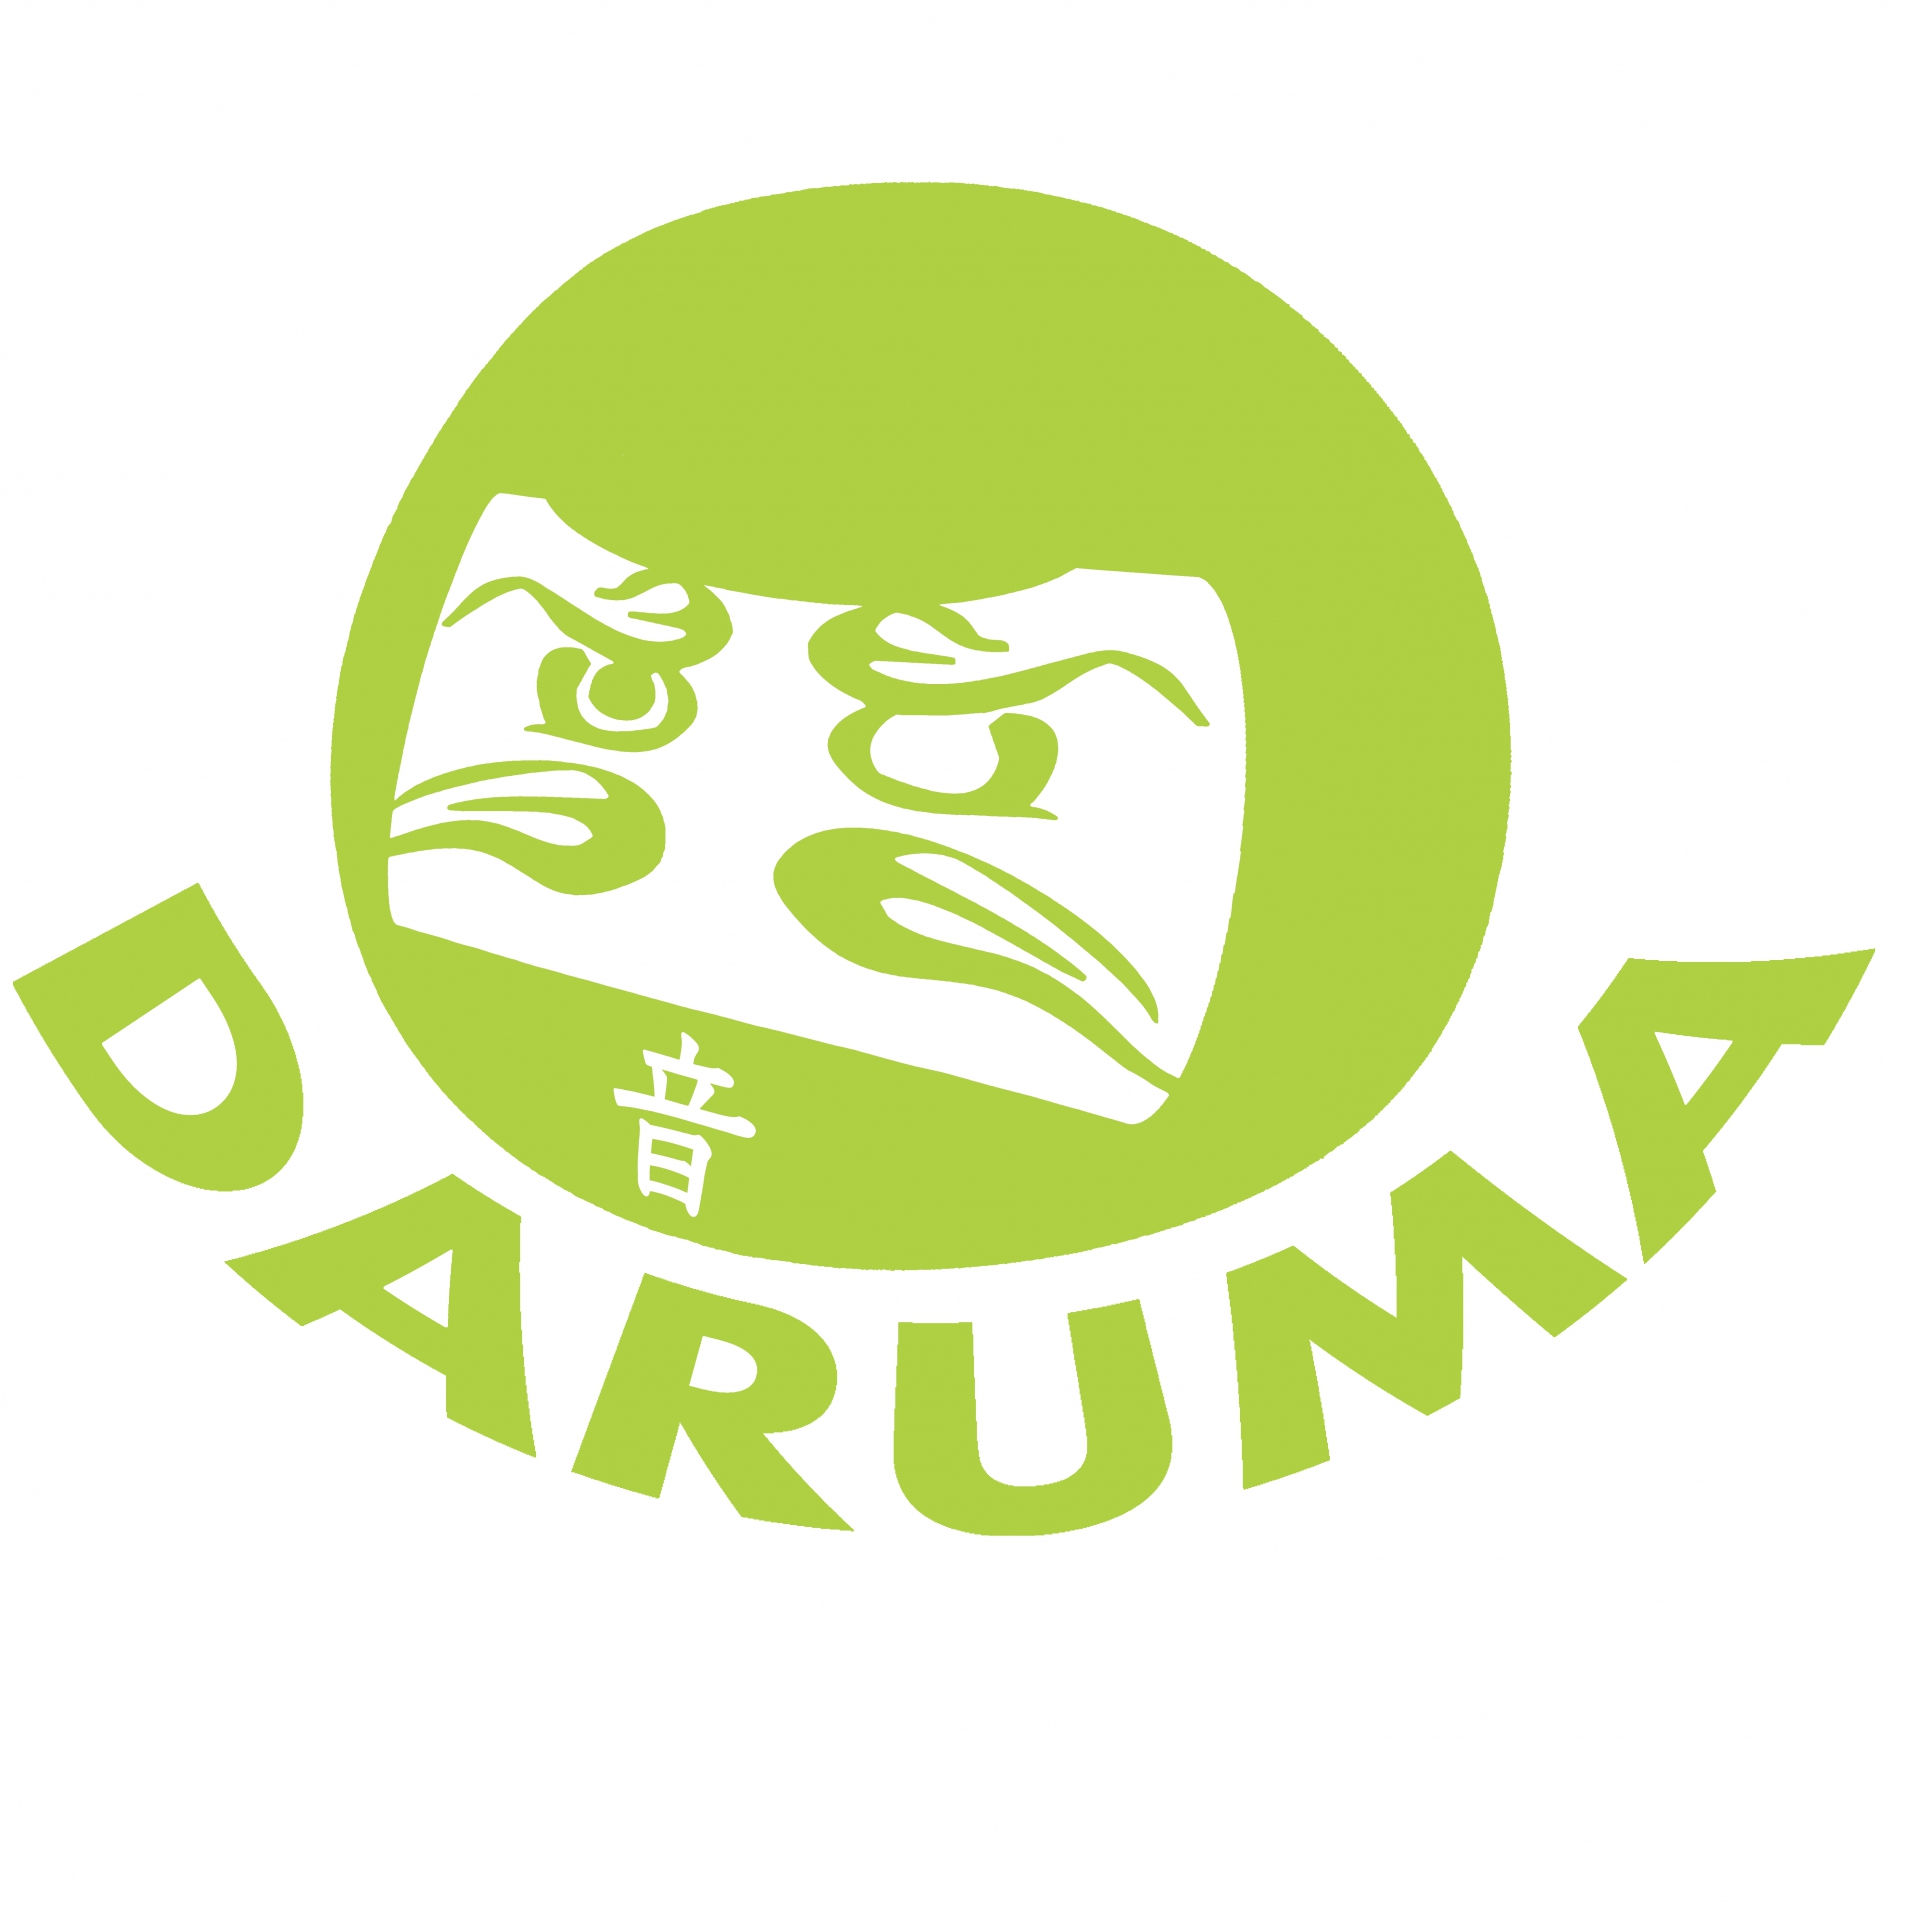 DARUMA だるま ロゴ